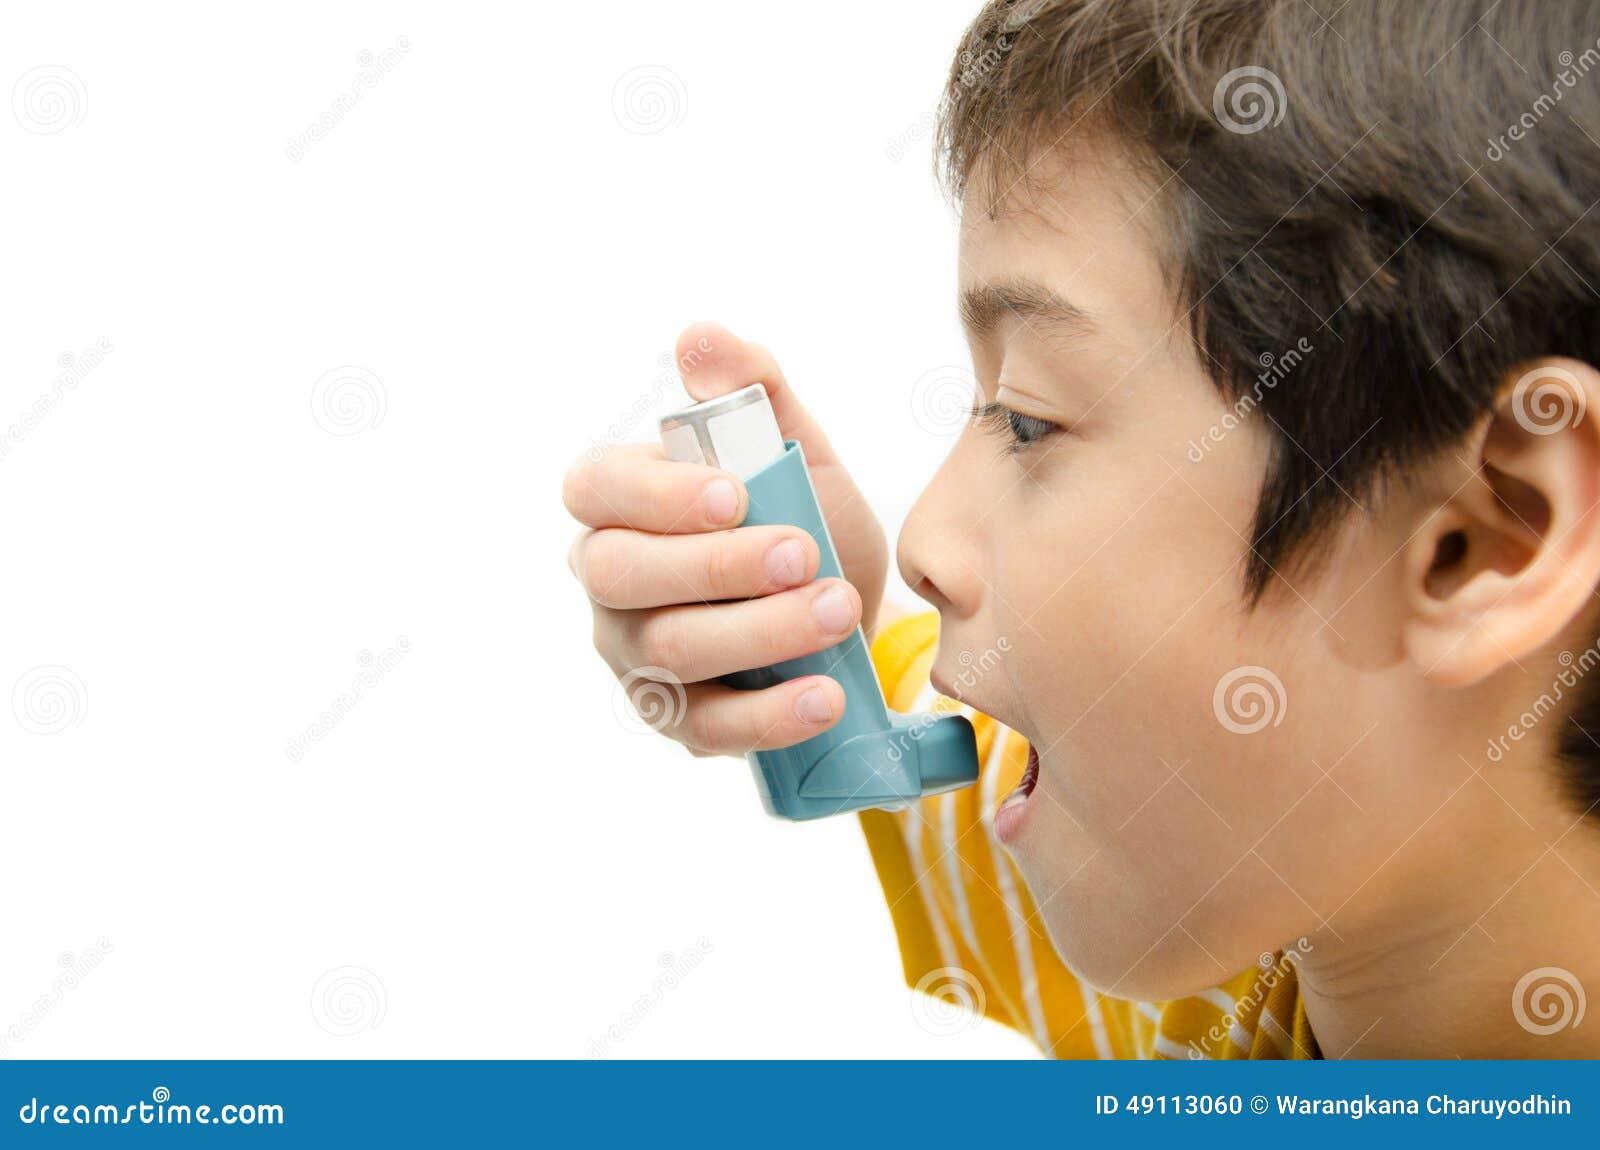 Little boy using Asthma inhaler for breathing